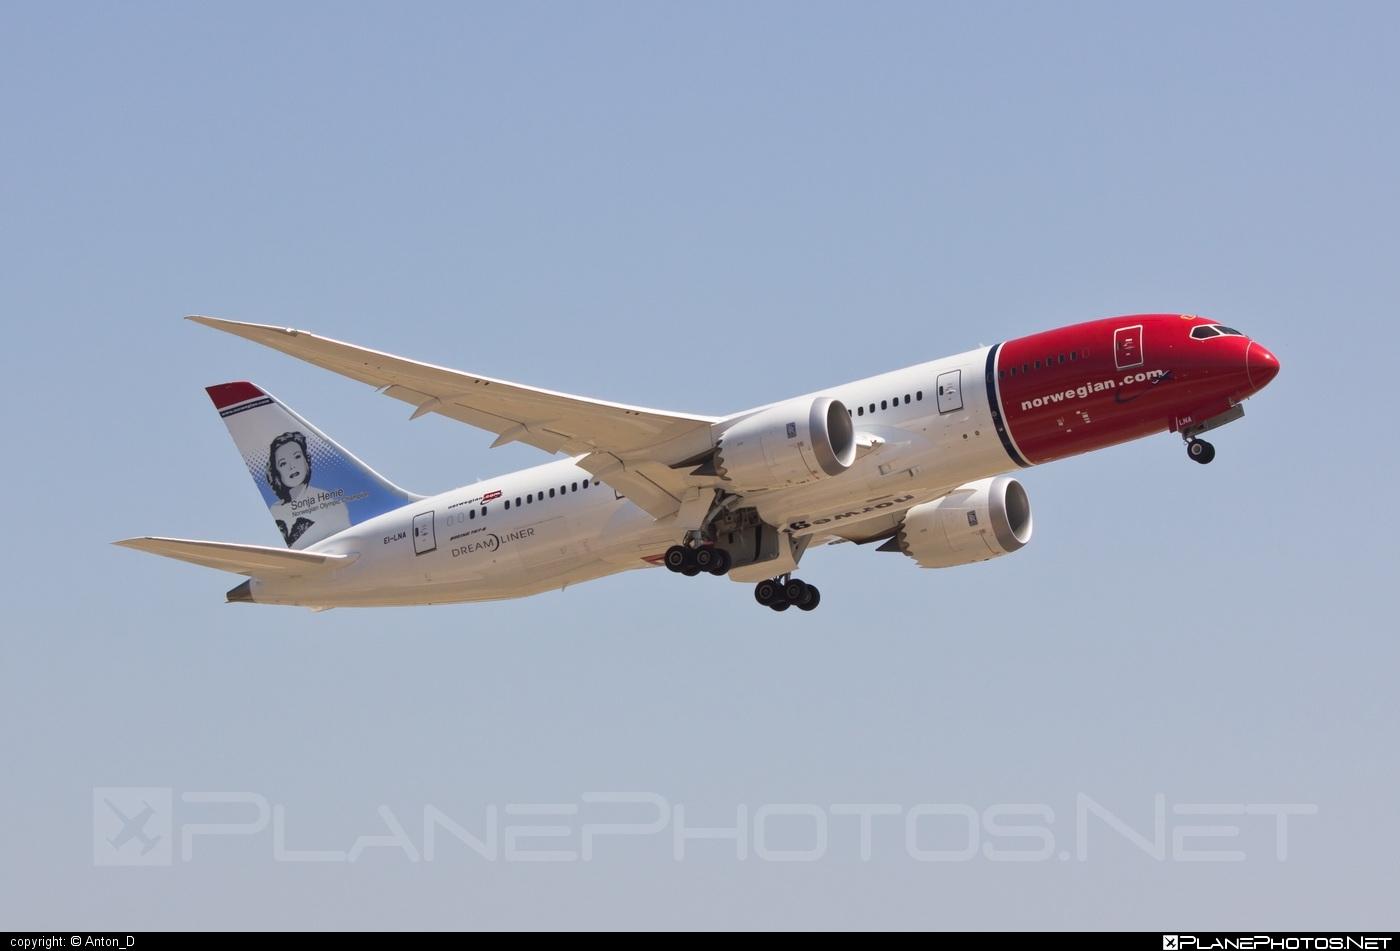 Boeing 787-8 Dreamliner - EI-LNA operated by Norwegian Air Shuttle #b787 #boeing #boeing787 #dreamliner #norwegian #norwegianair #norwegianairshuttle